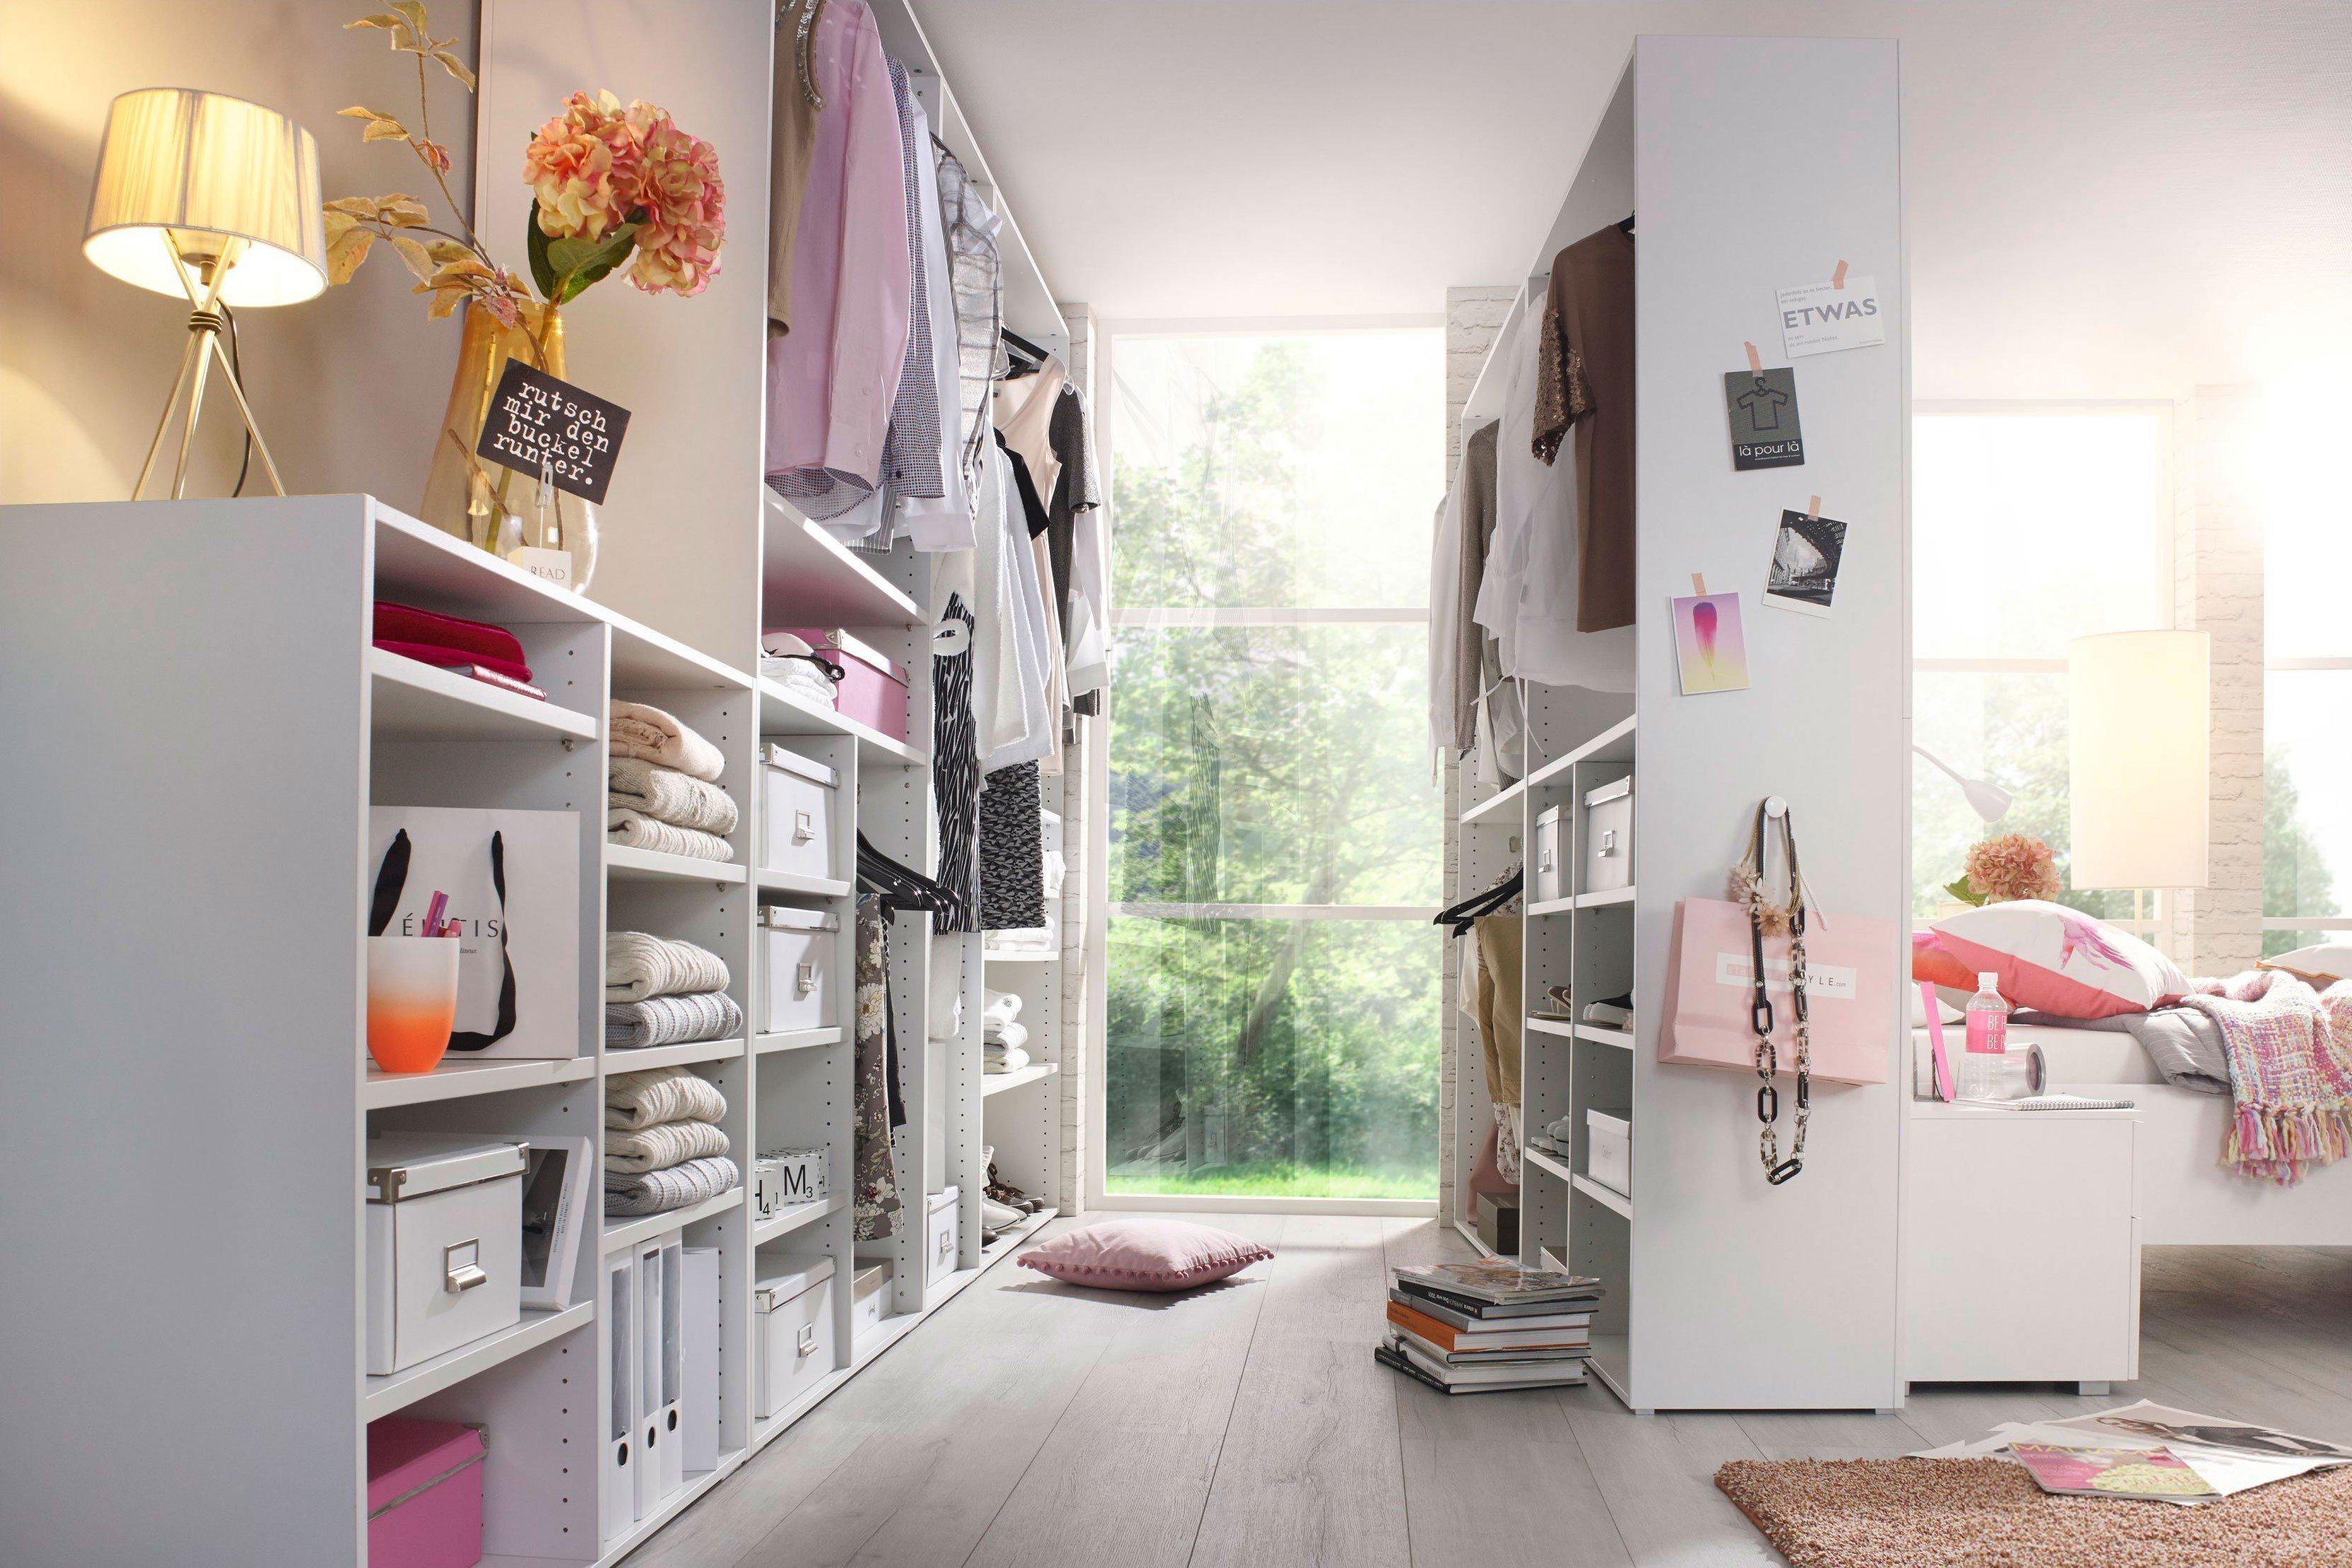 deko ankleidezimmer modell wohndesign. Black Bedroom Furniture Sets. Home Design Ideas